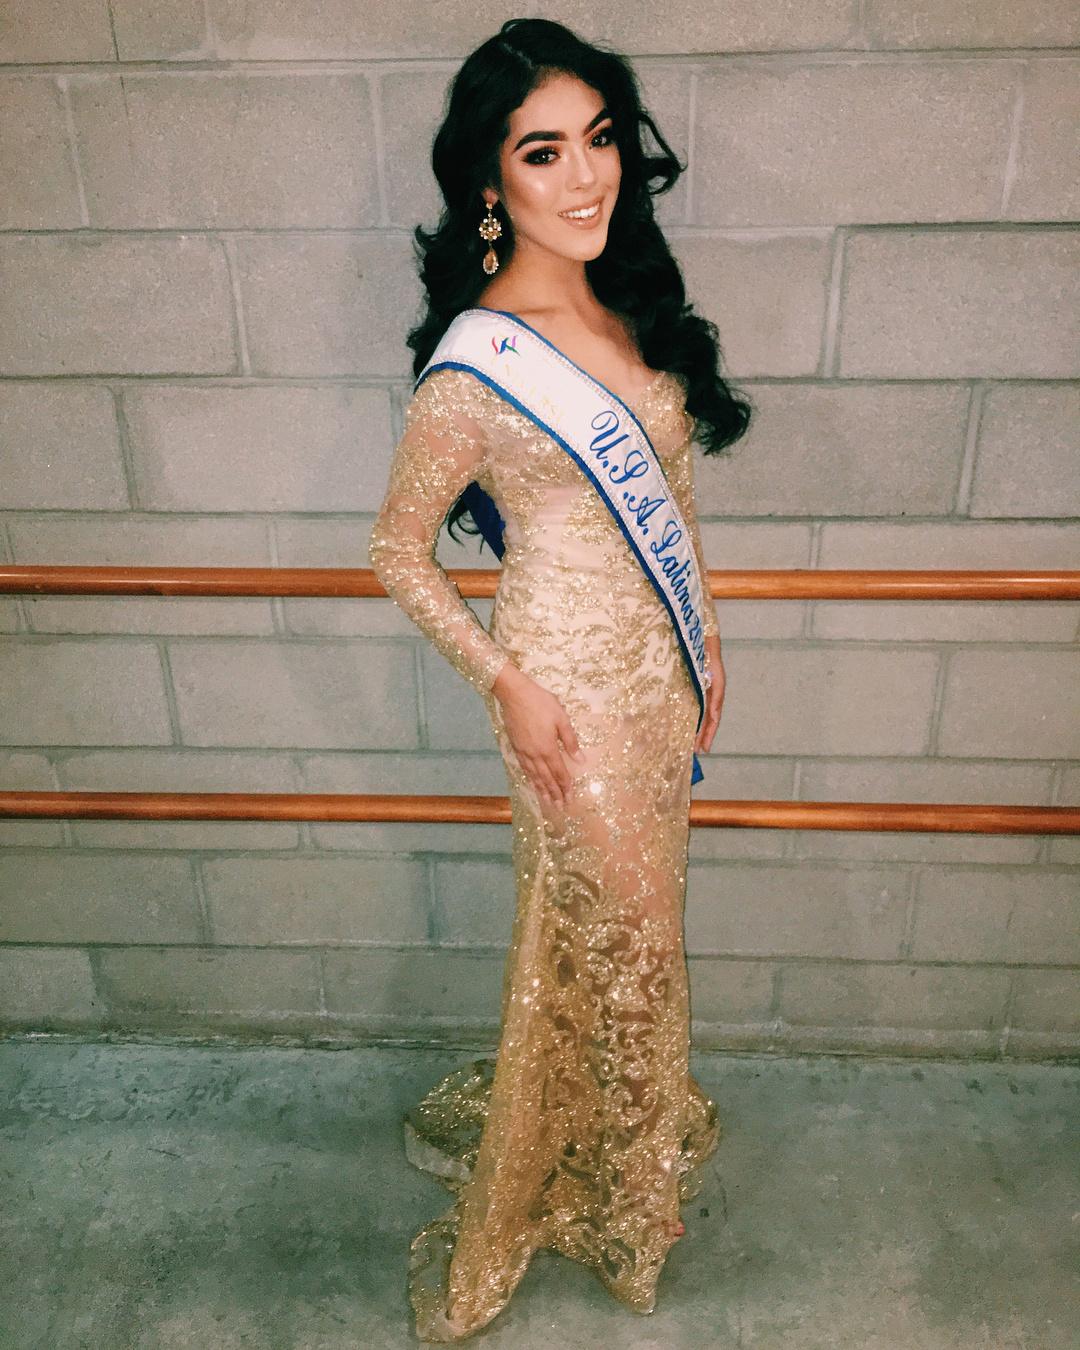 kristian de leon, miss teen mundial usa 2019/top 16 de teen universe 2018. - Página 3 37377210